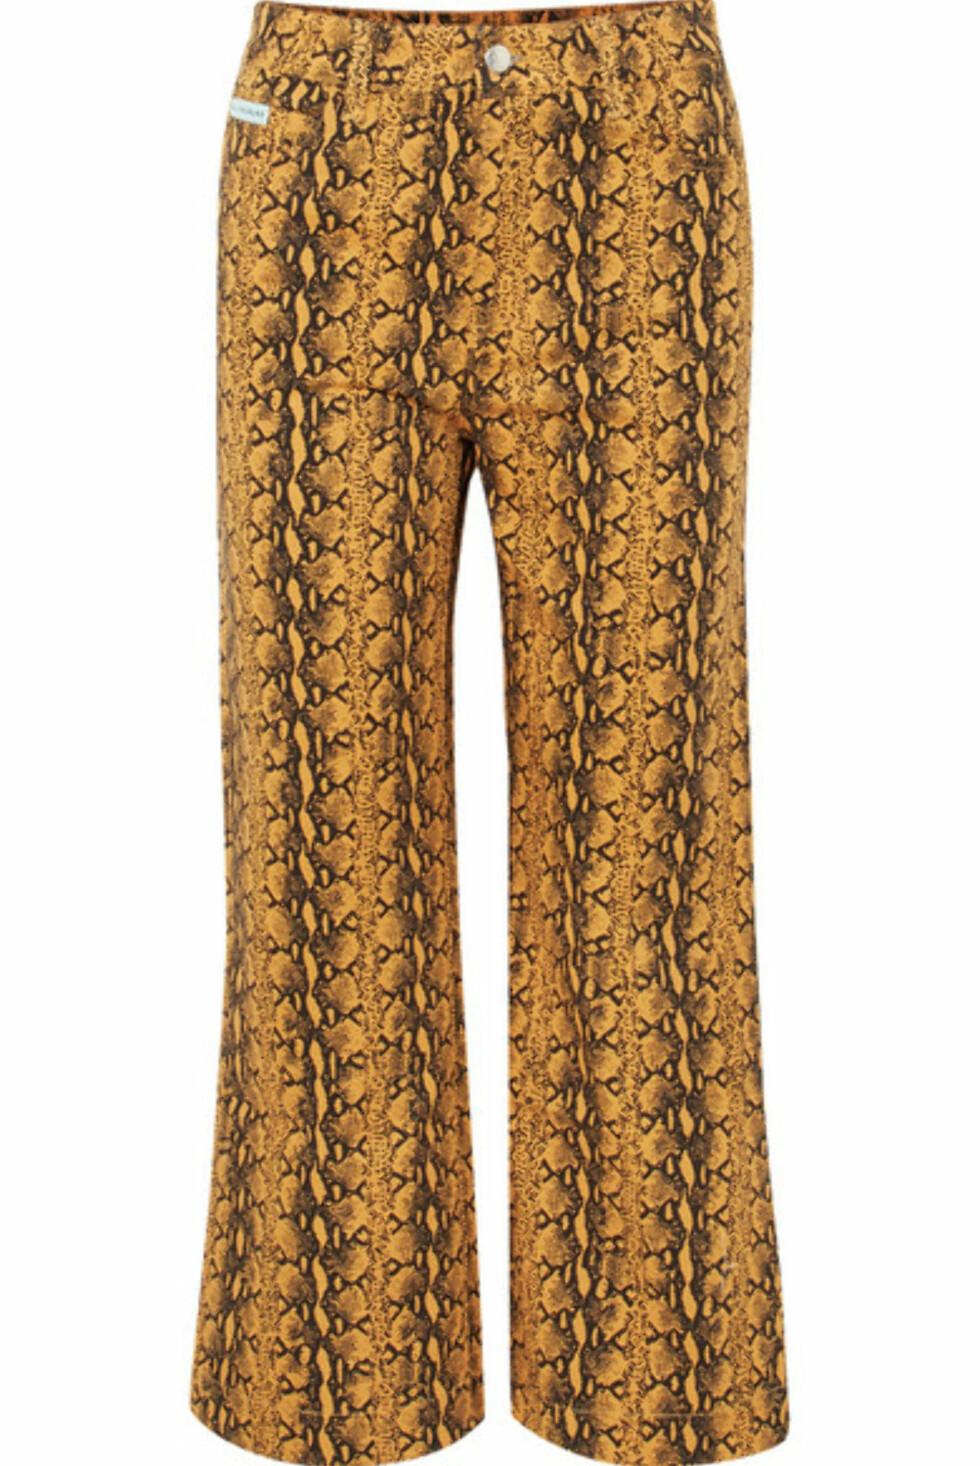 Bukse fra Alexa Chung |2700,-| https://www.net-a-porter.com/no/en/product/1062602/alexachung/cropped-snake-print-high-rise-wide-leg-jeans